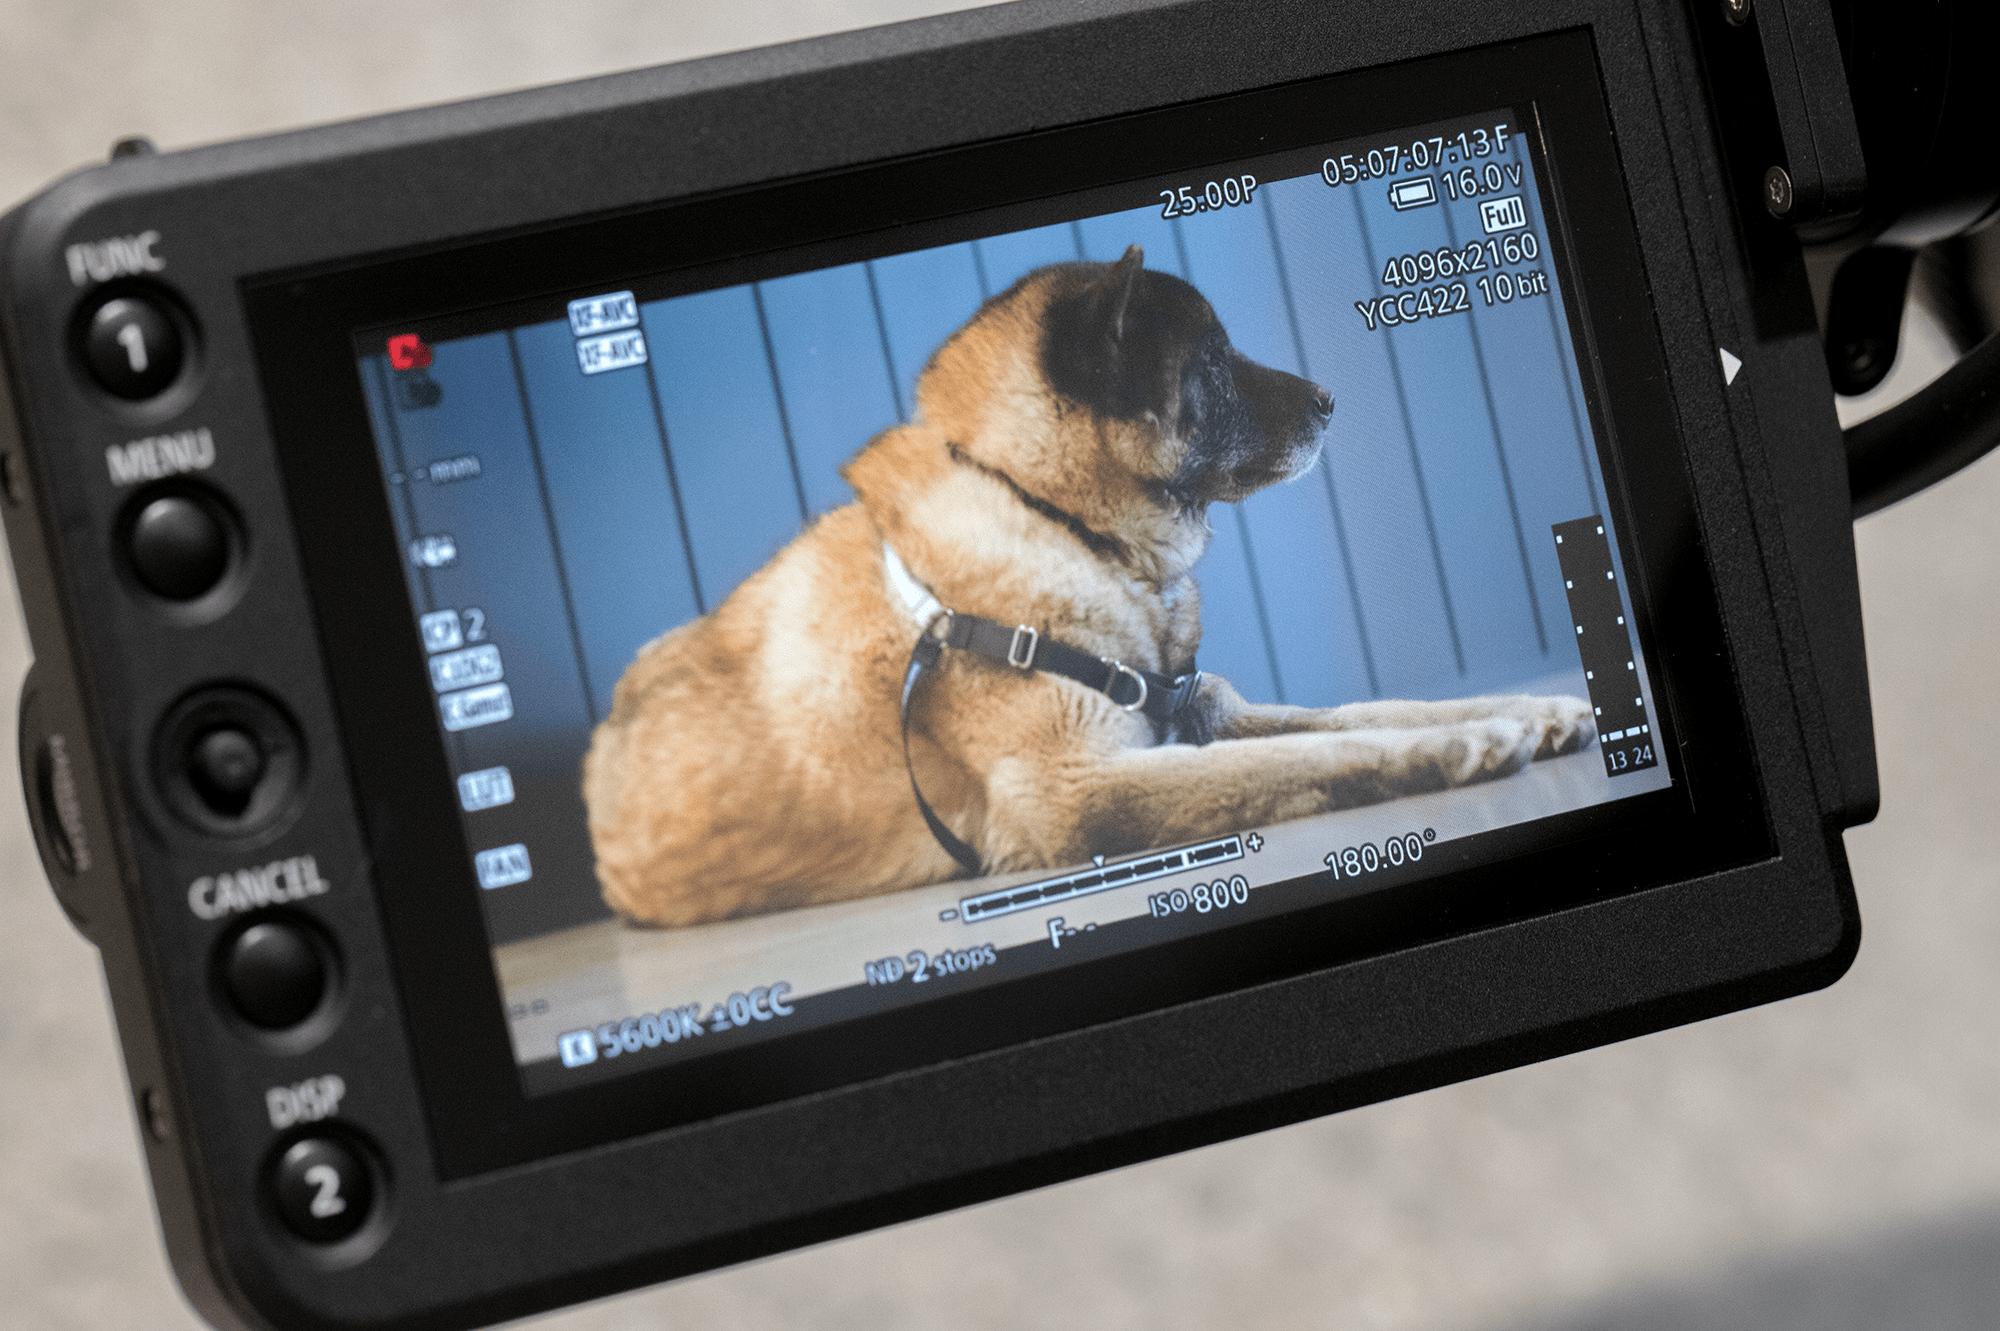 Canon C500 MKII Recording Resolutions